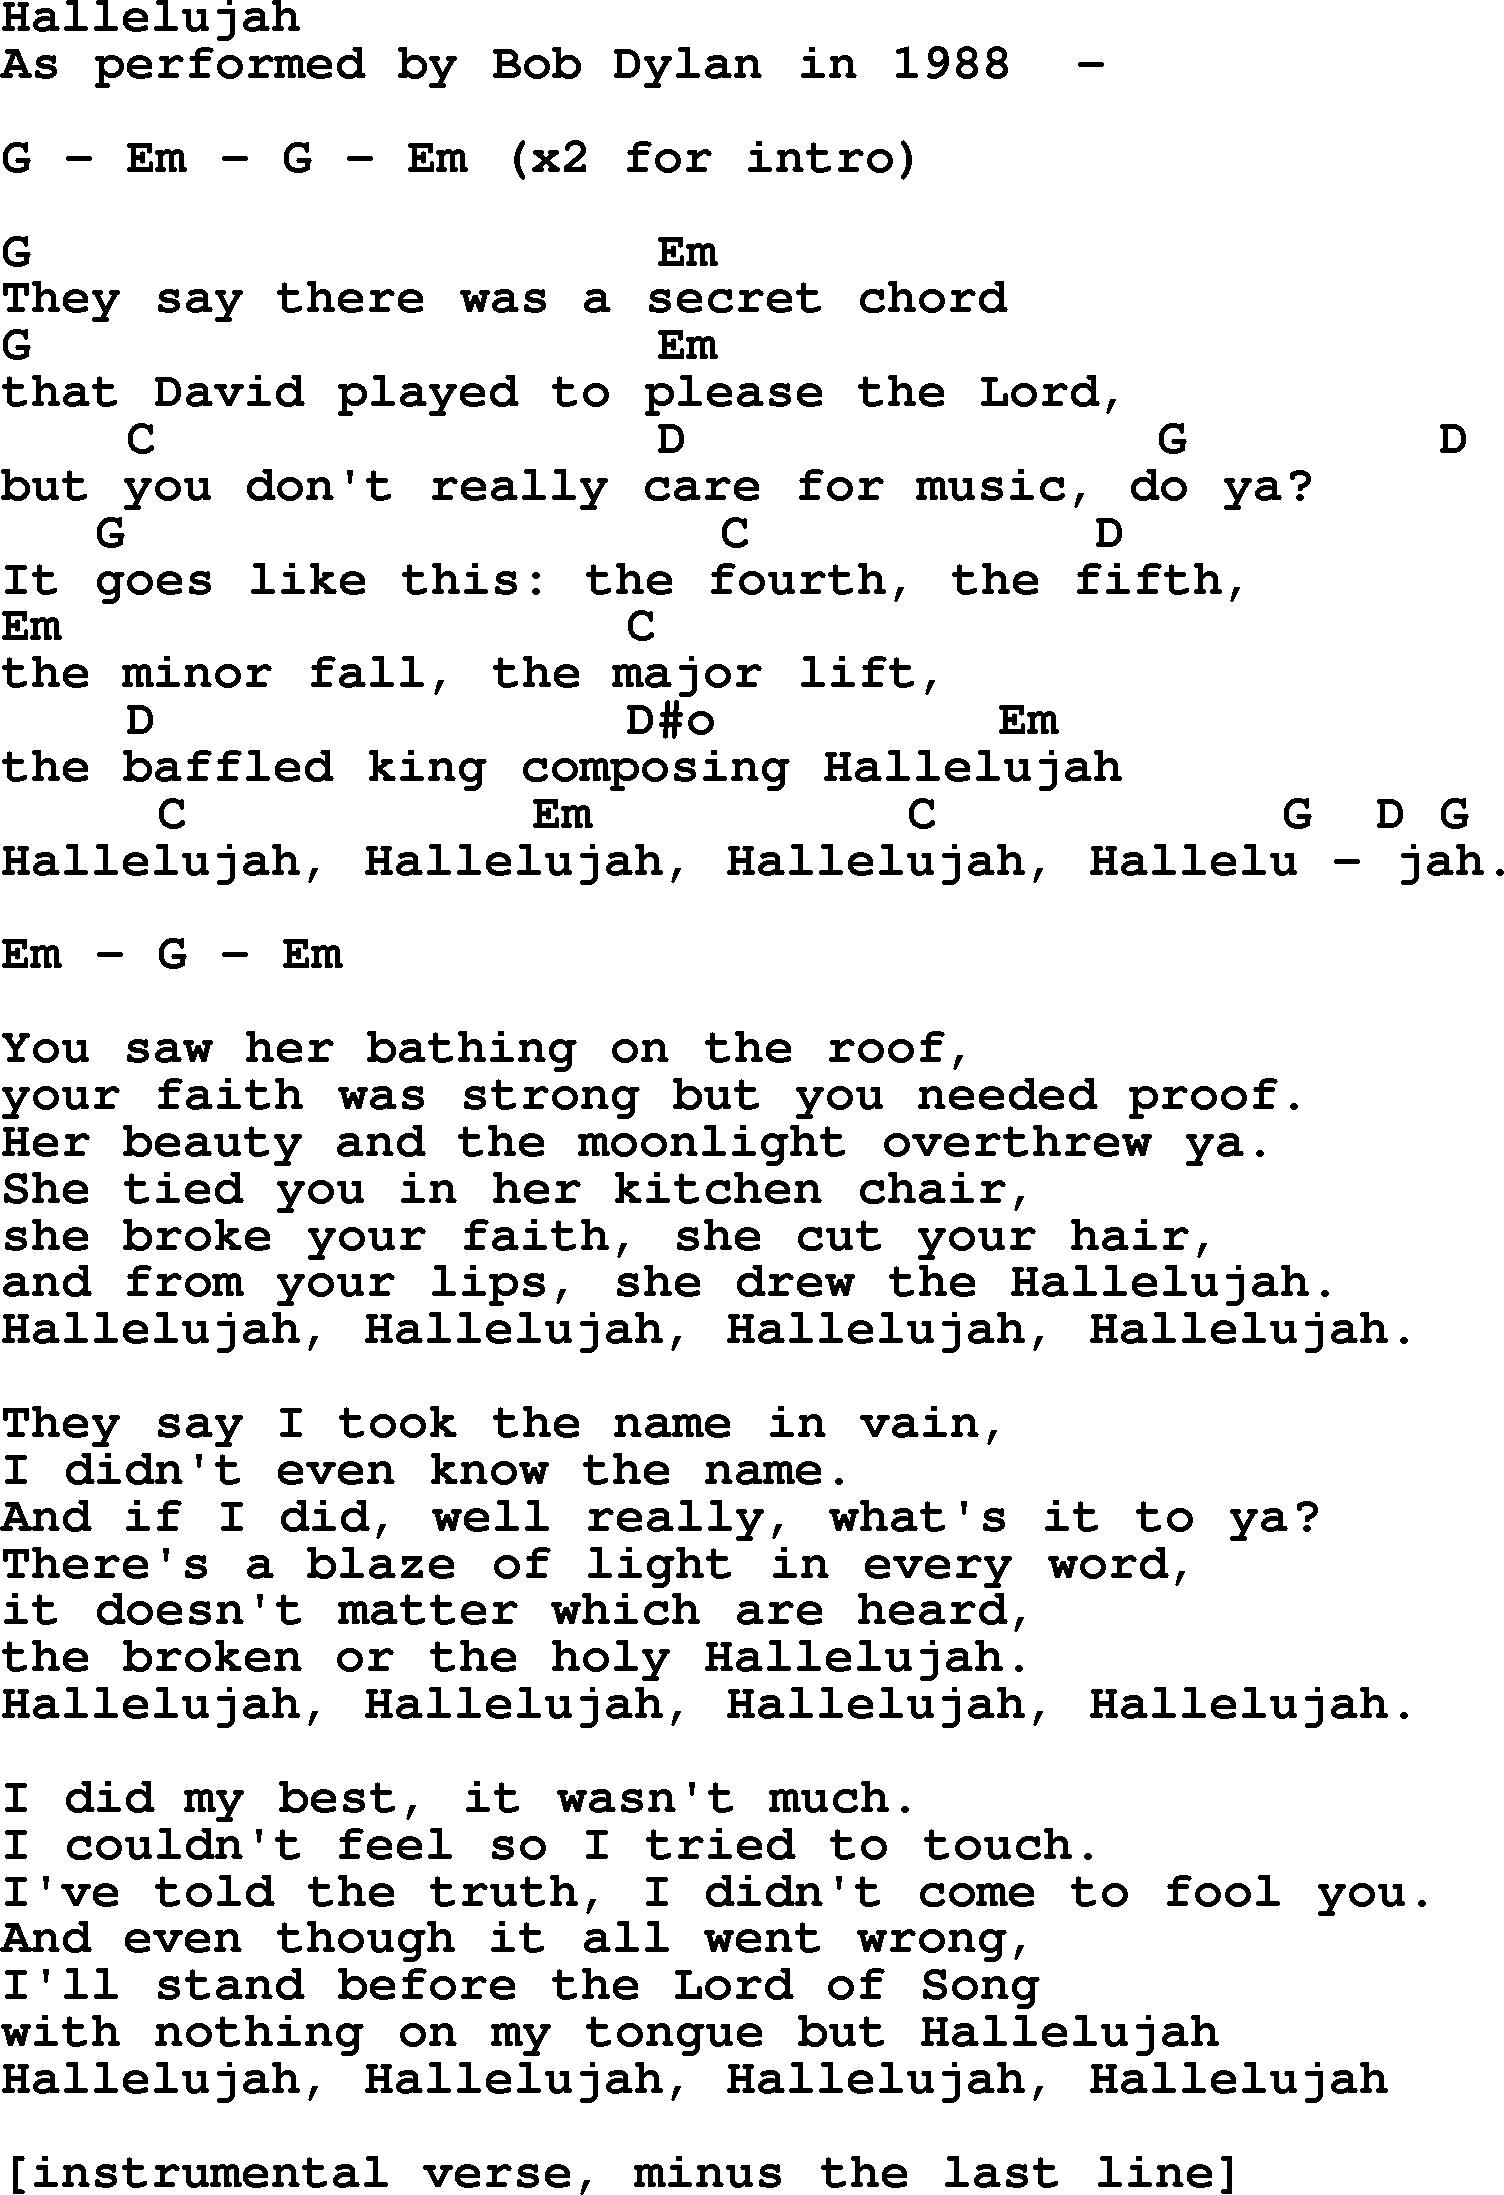 Hallelujah Ukulele Chords Bob Dylan Song Hallelujah Lyrics And Chords